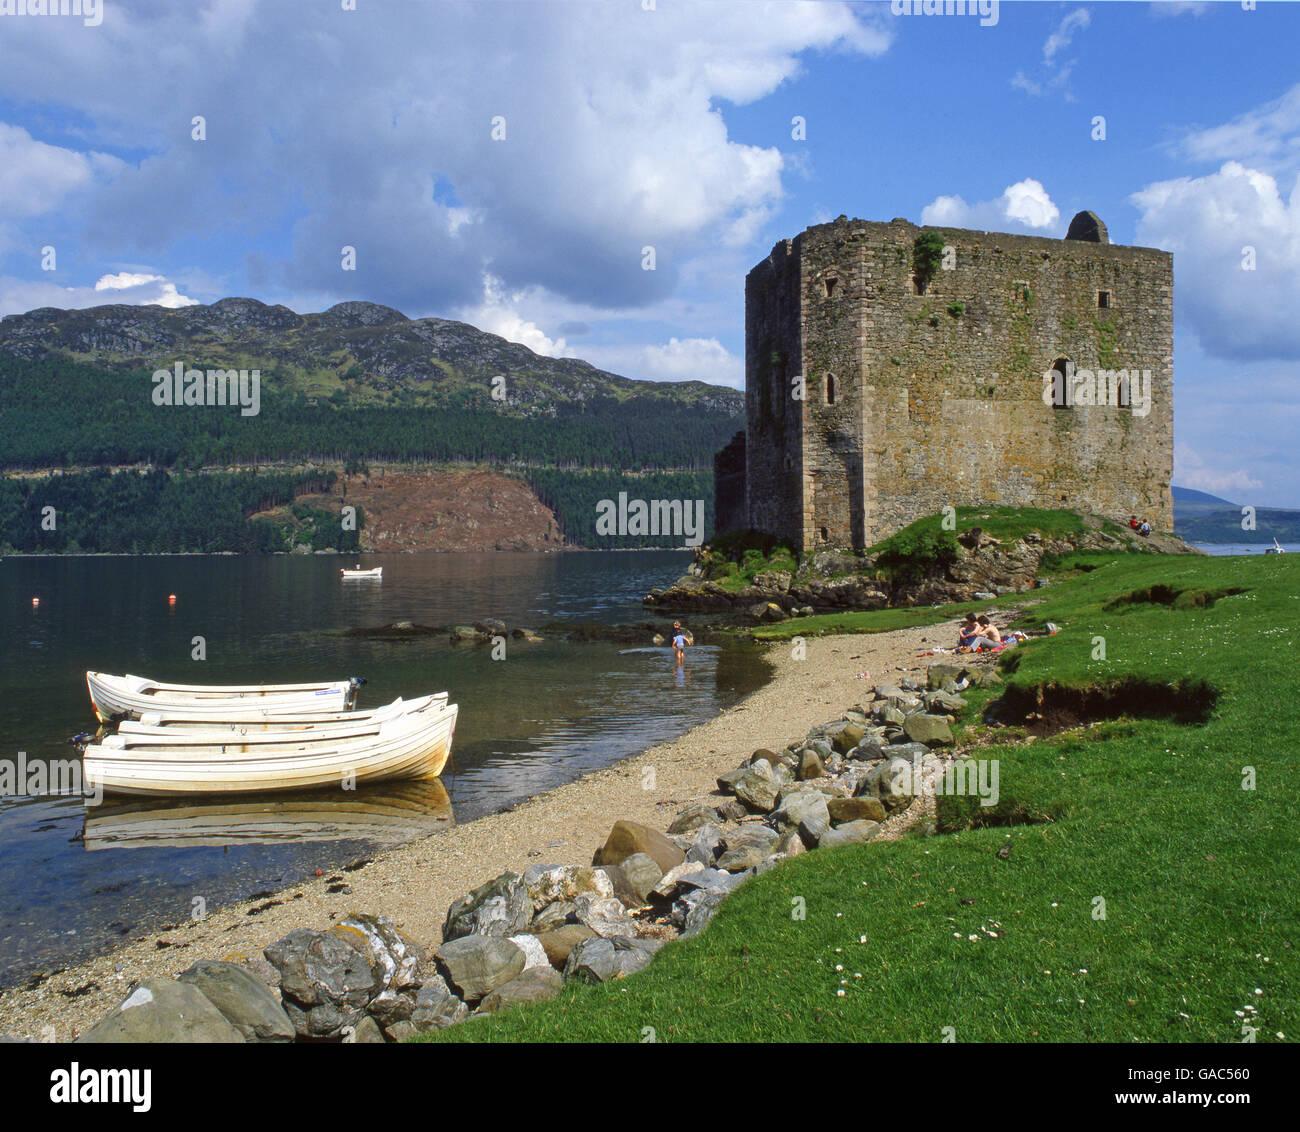 Carrick Castle is a 15th century tower house on the shore of Loch Goil, near Lochgoilhead, Argylll - Stock Image